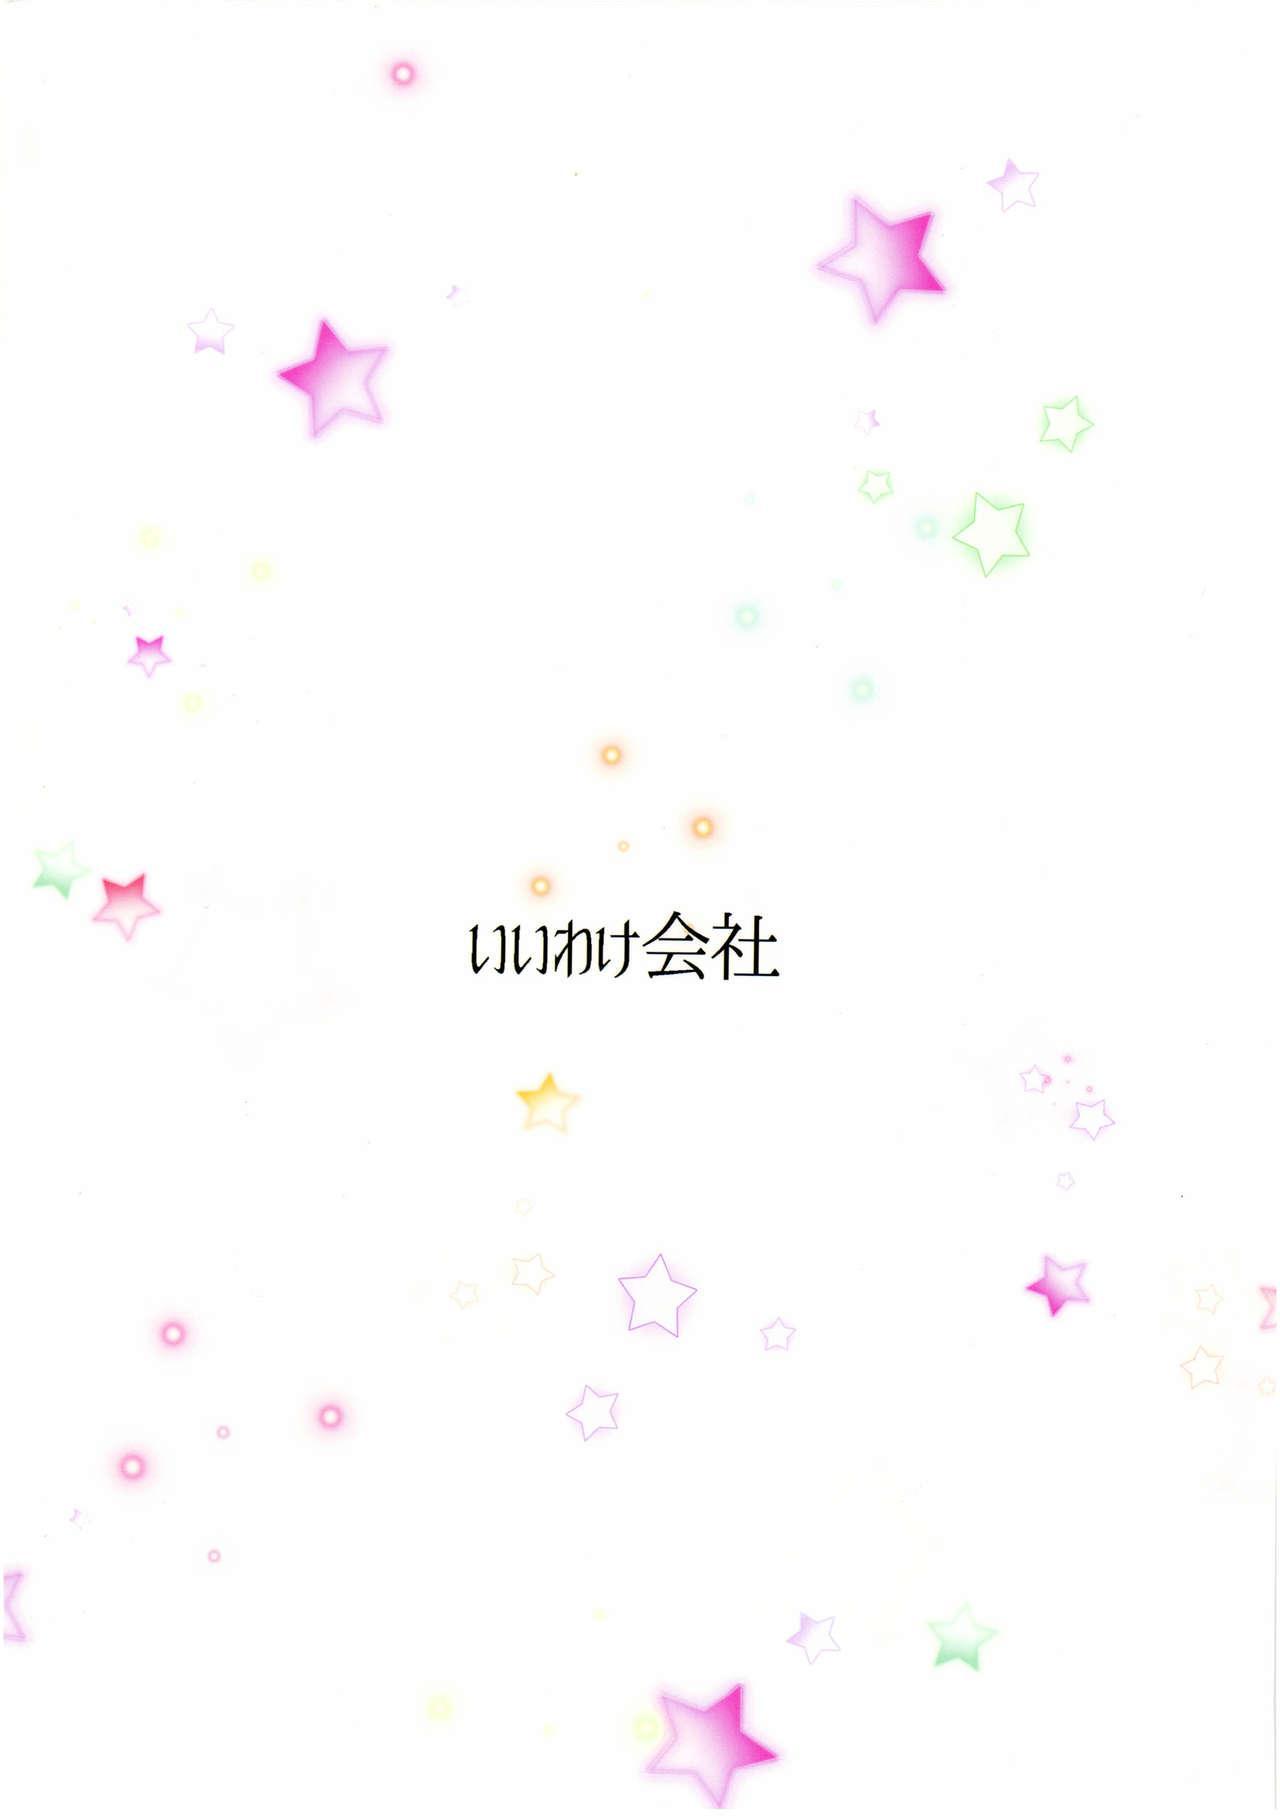 Oppai Settai Alice-chan 9